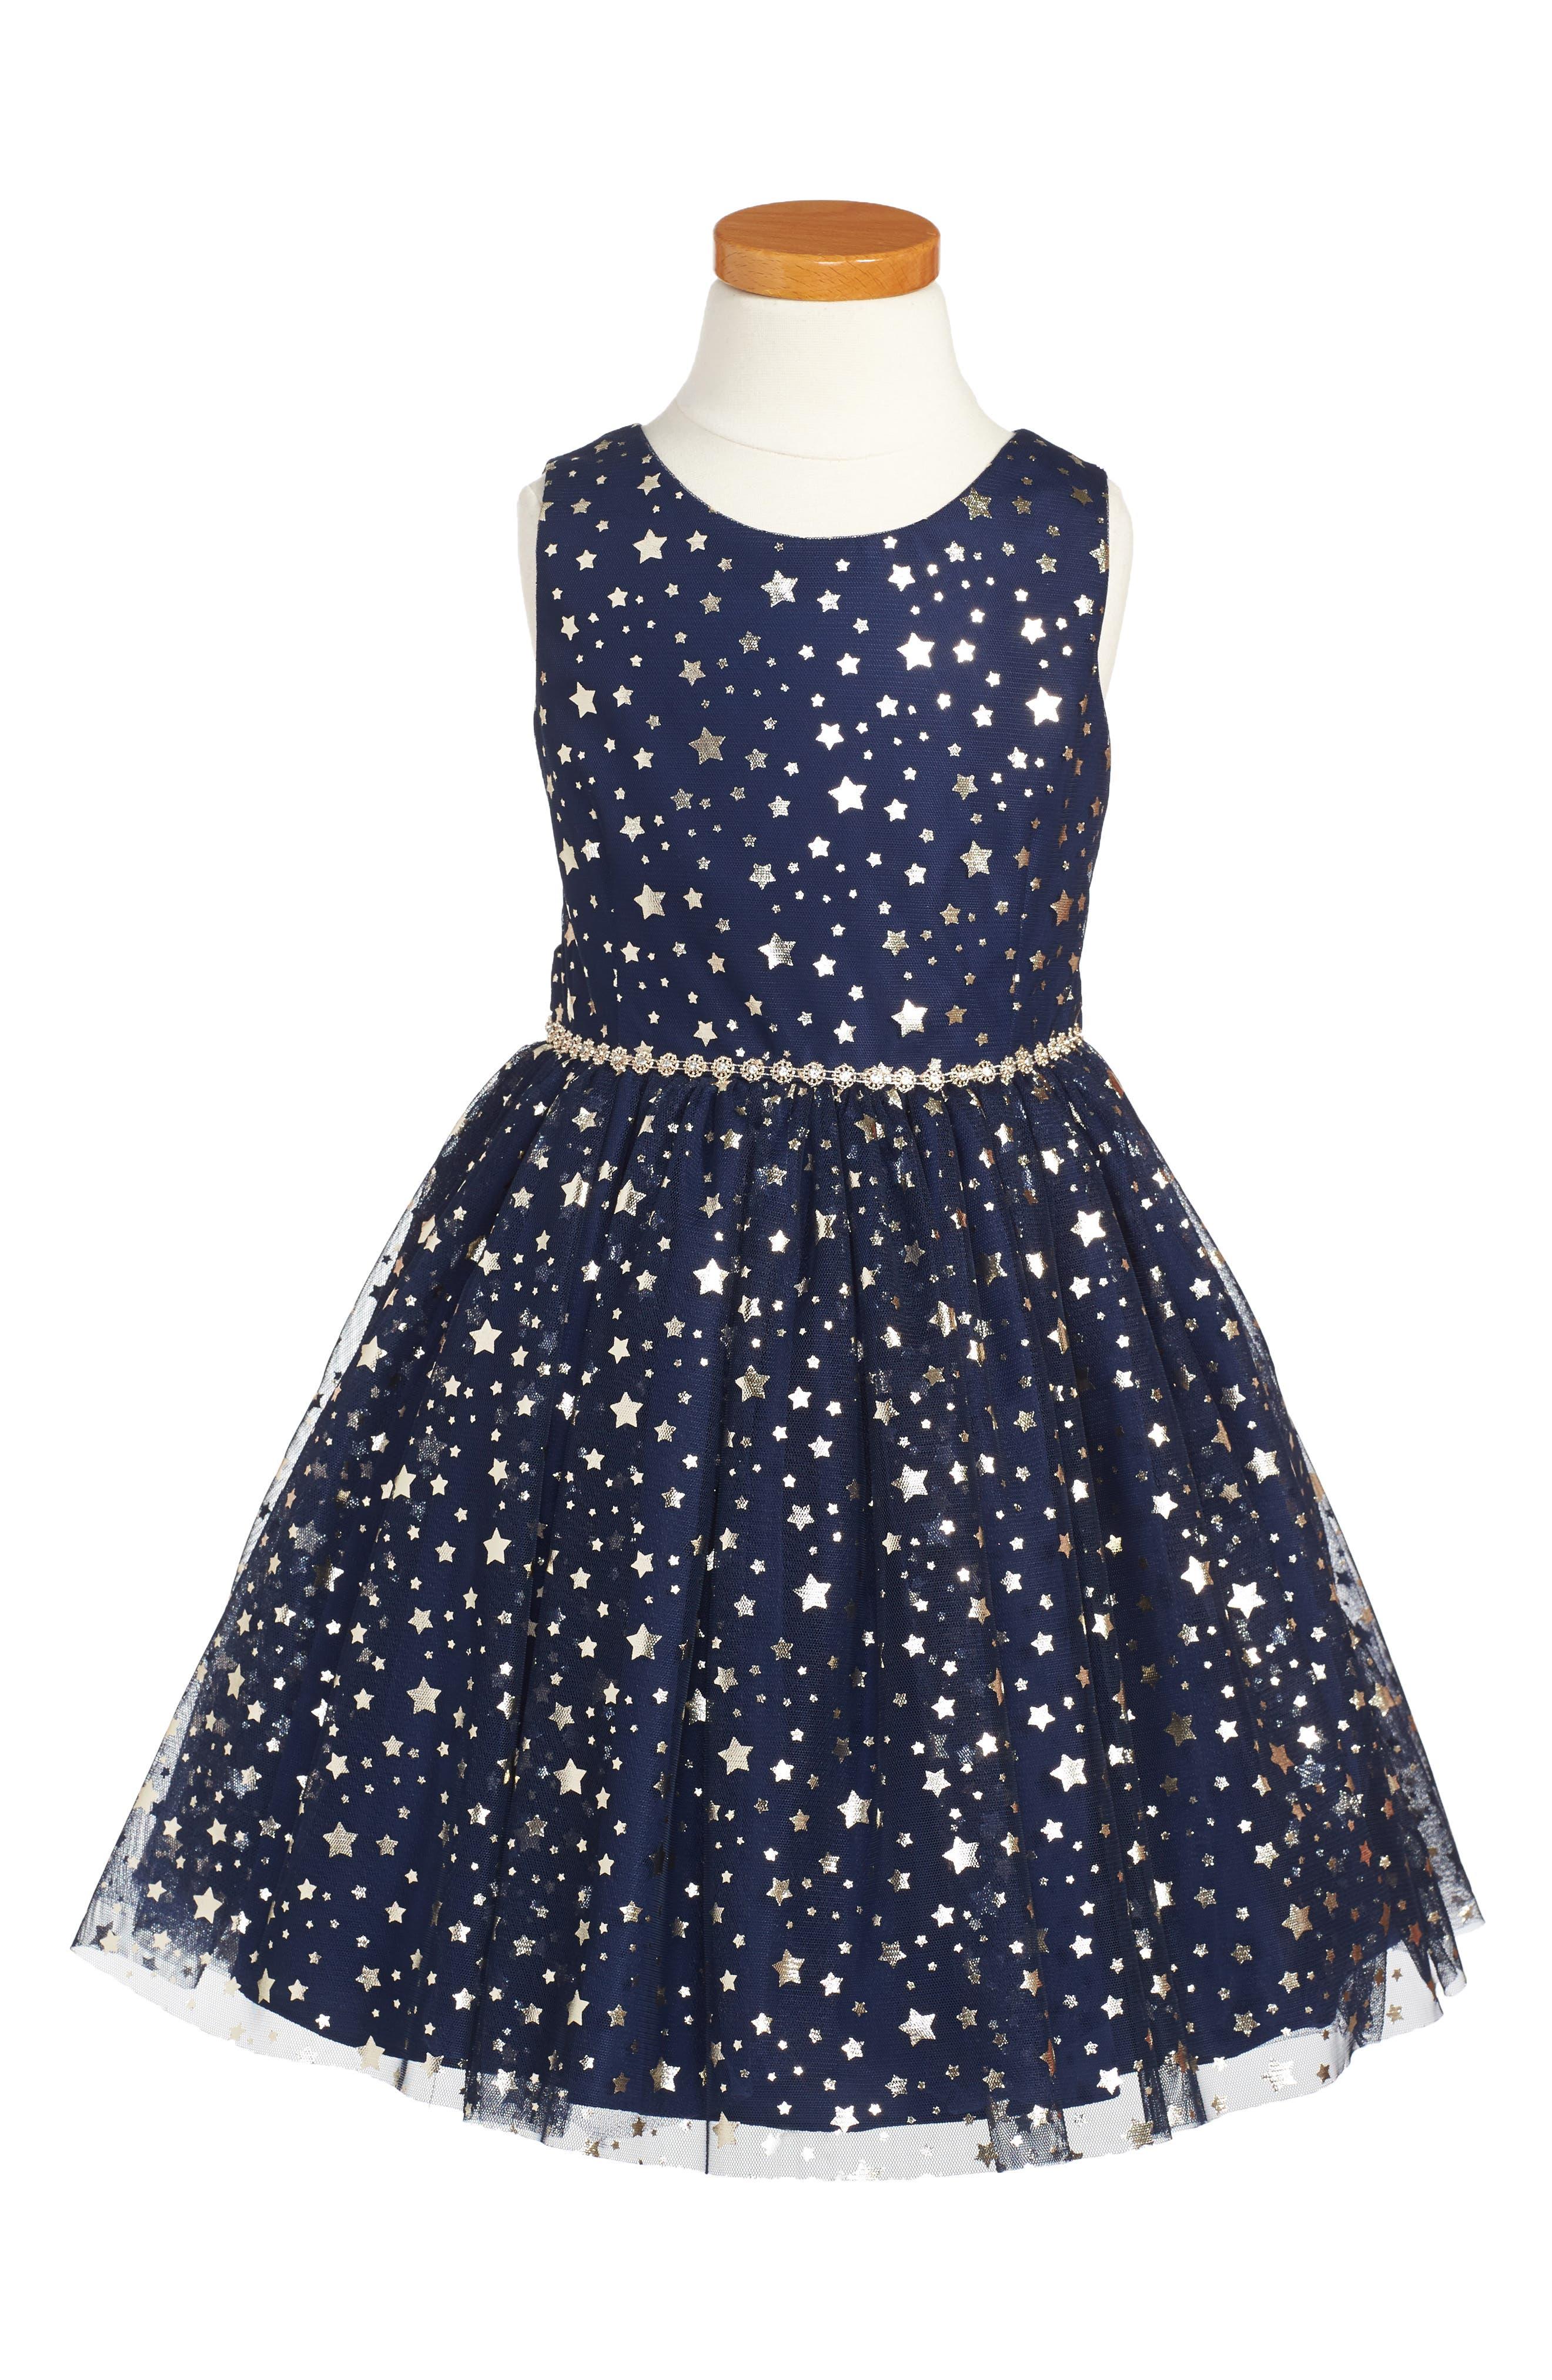 Main Image - Pippa & Julie Metallic Stars Party Dress (Toddler Girls, Little Girls & Big Girls)